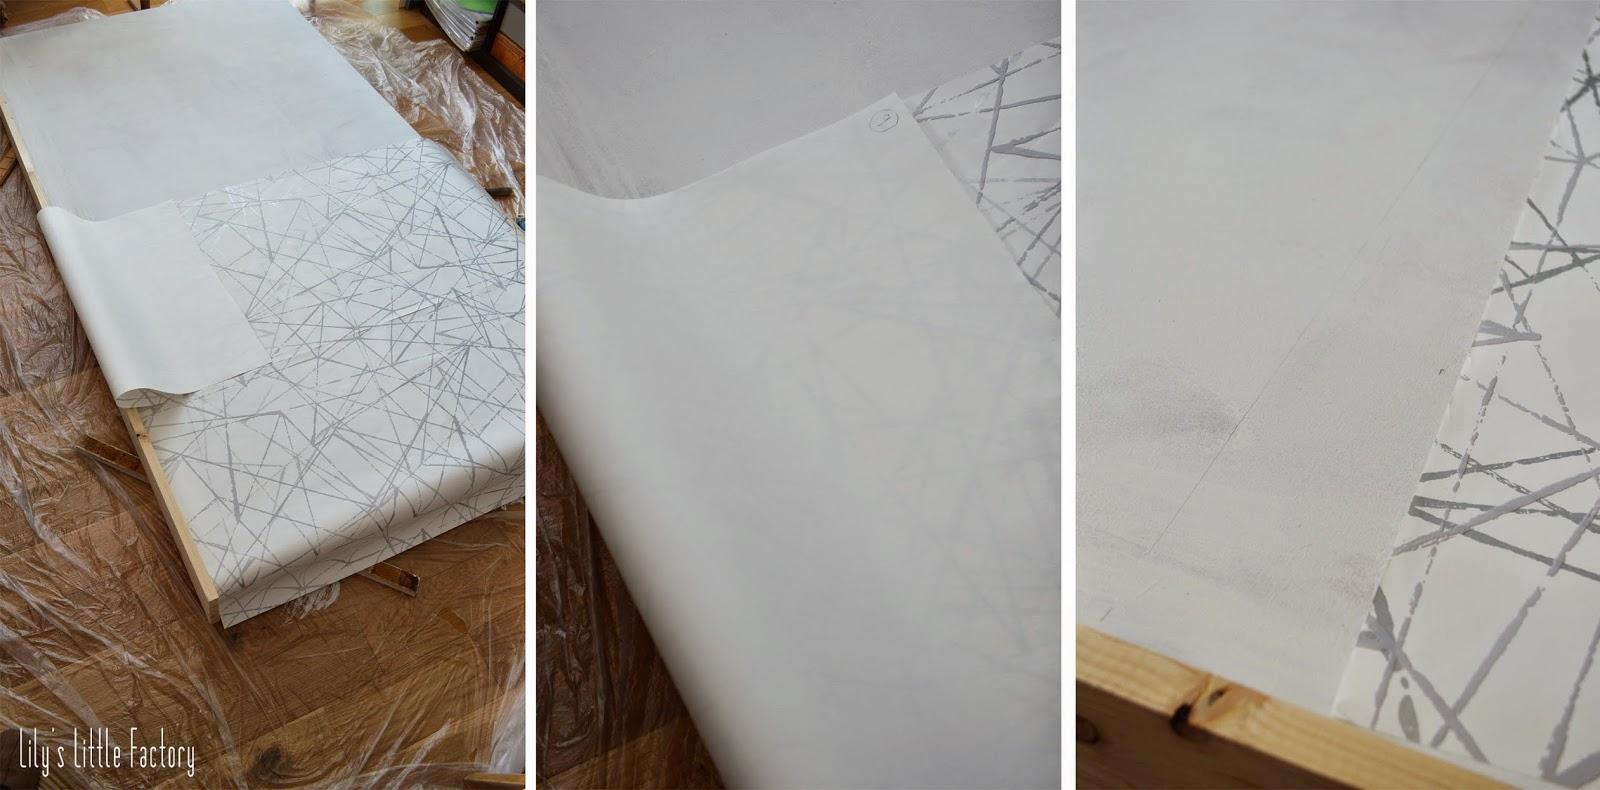 poser du papier peint avec raccord. Black Bedroom Furniture Sets. Home Design Ideas